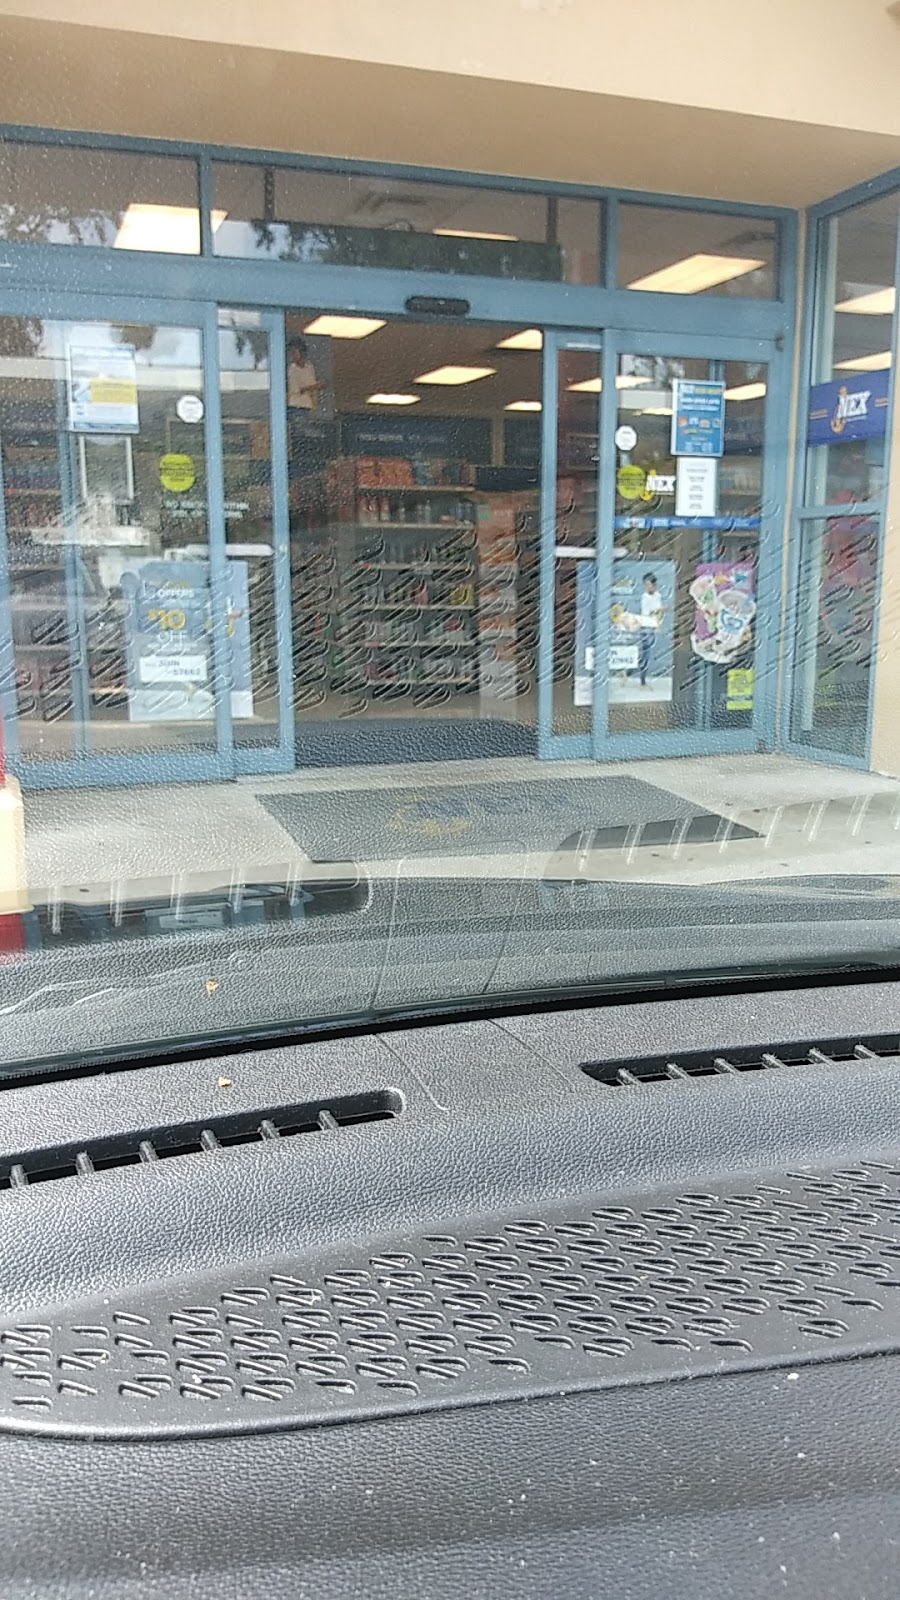 NS Mayport NEX Mini-Mart - convenience store  | Photo 1 of 5 | Address: 3600 Mayport Rd, Jacksonville, FL 32233, USA | Phone: (904) 242-3277